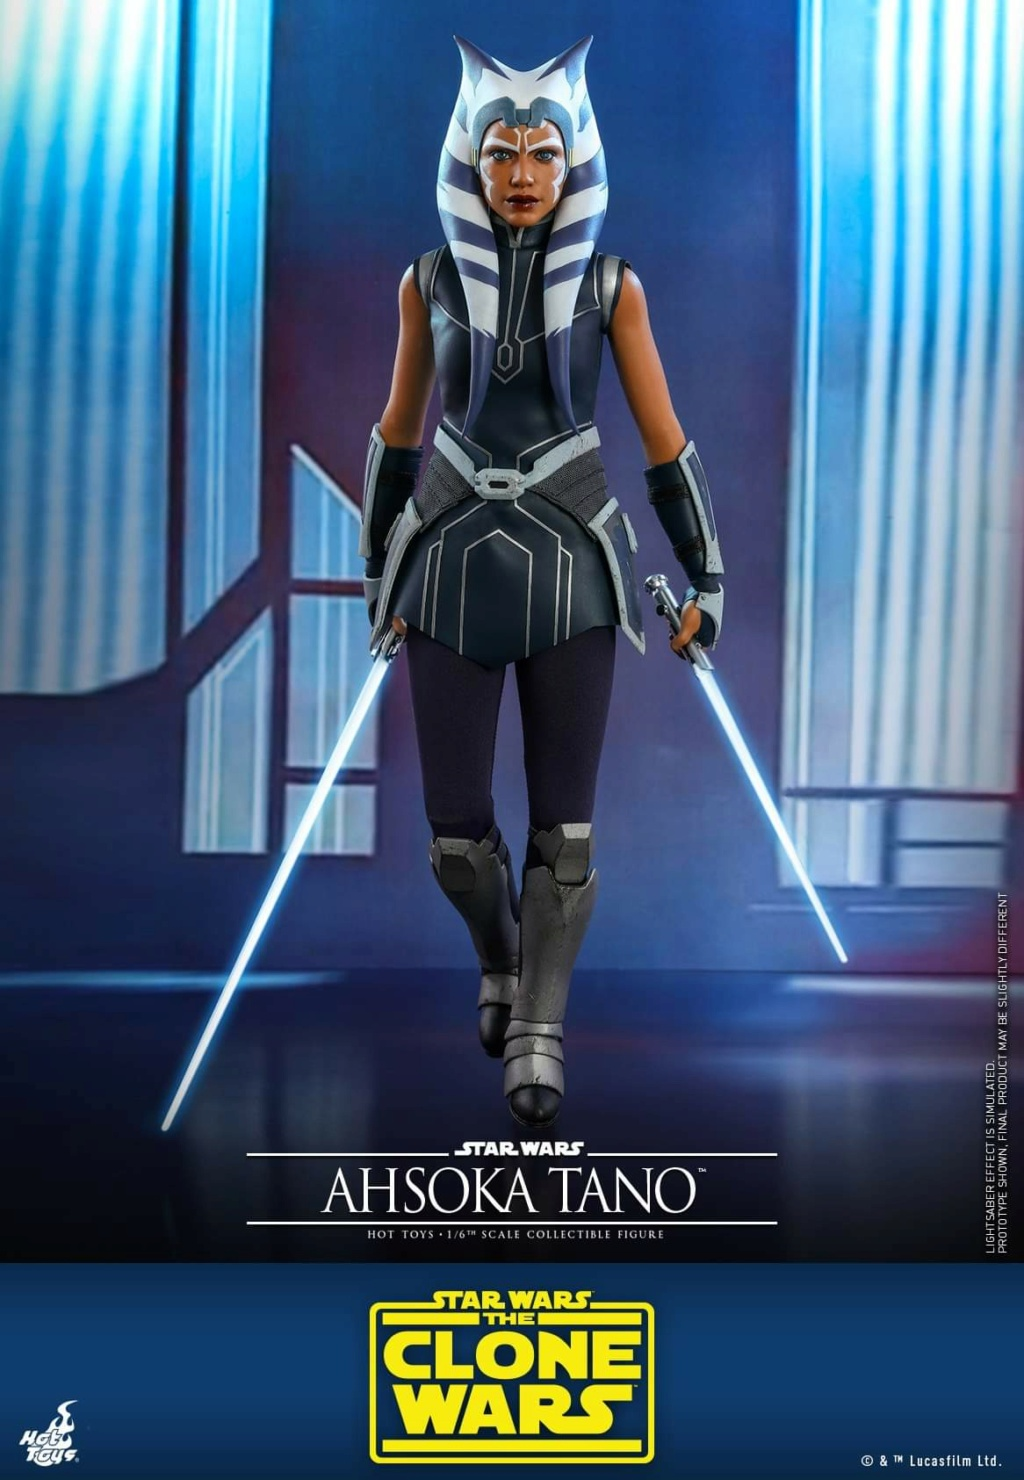 Ahsoka Tano - 1/6th scale - The Clone Wars - Hot Toys Fb_im131